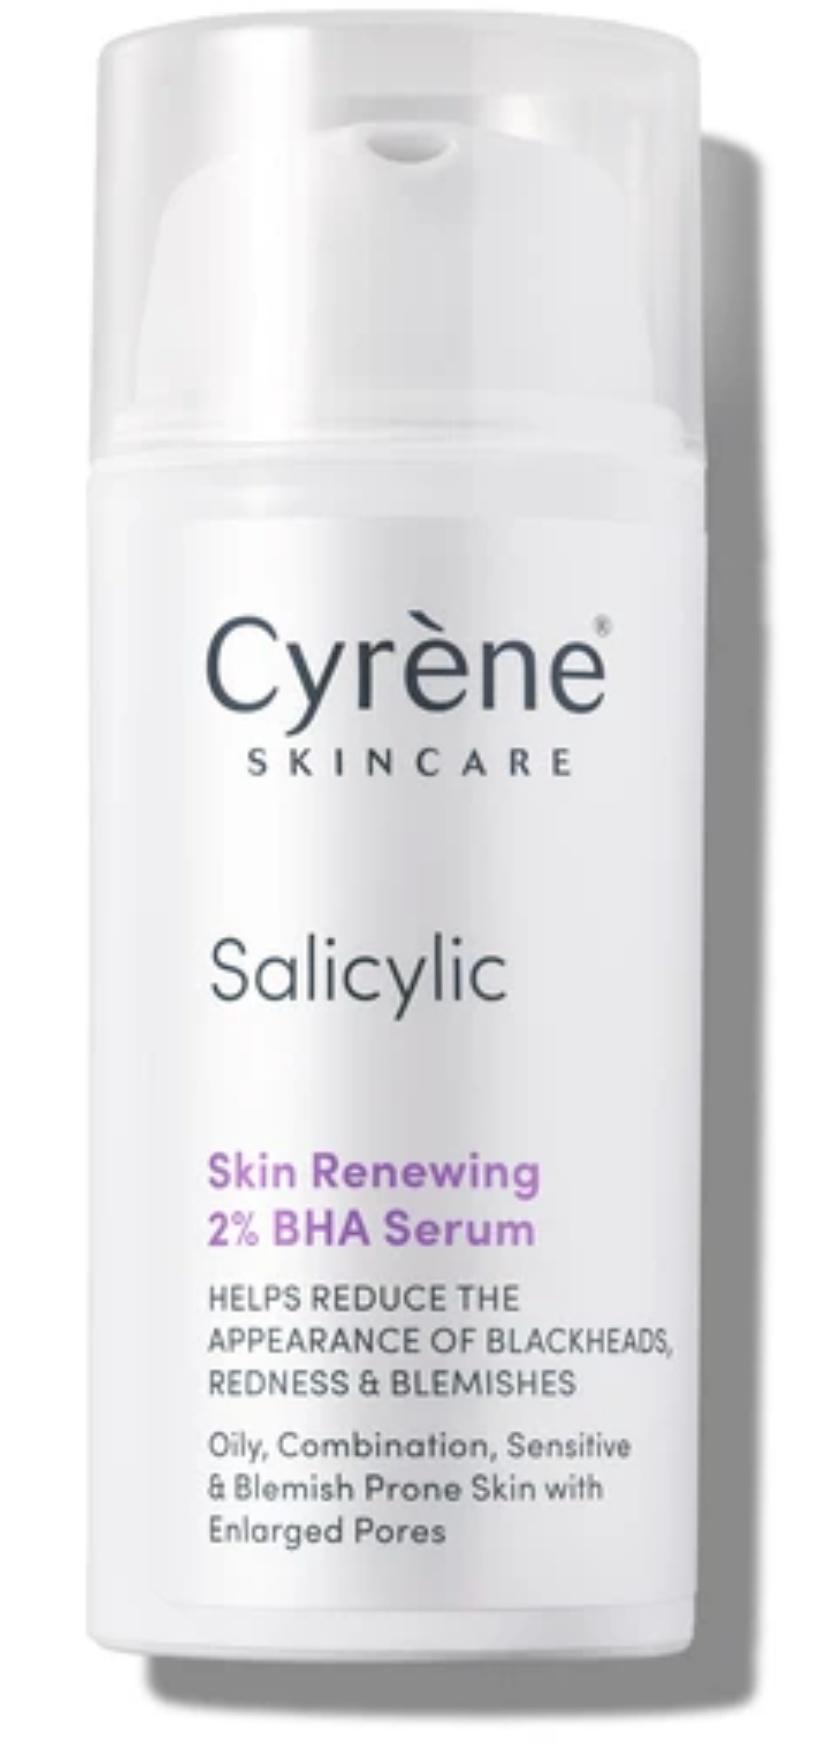 Cyréne Skin Renewing %2 Bha Serum